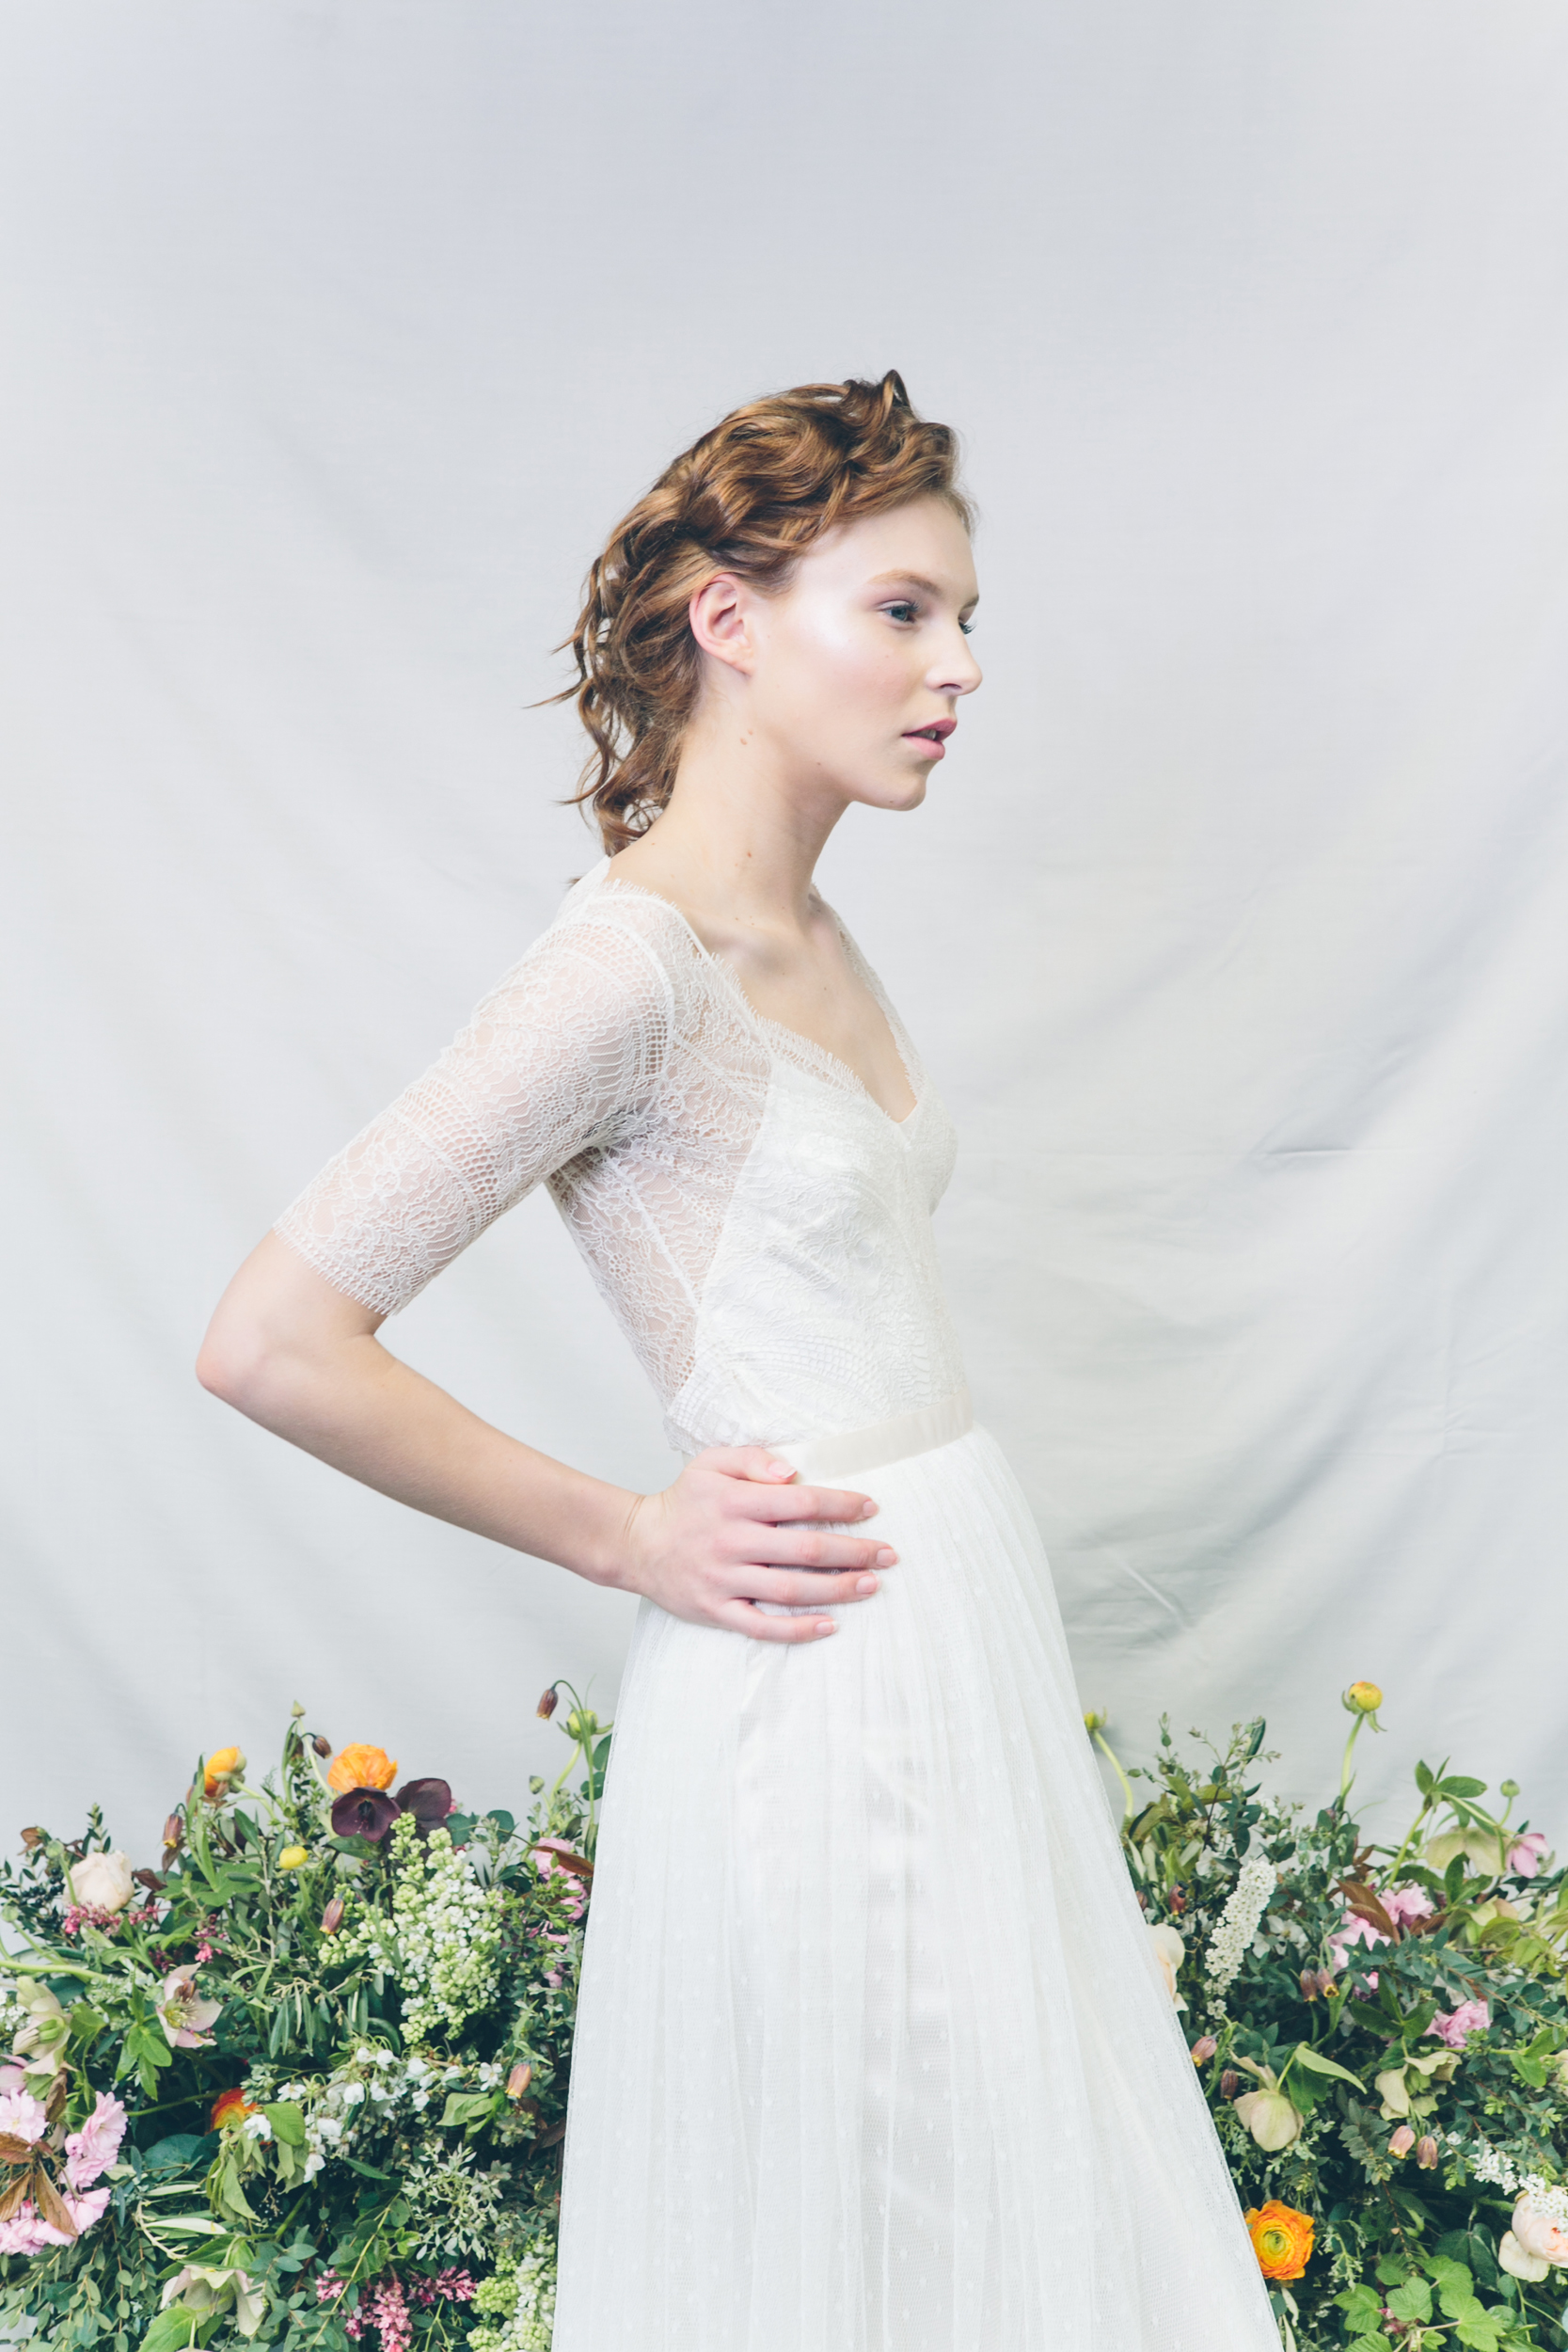 Kate-Beaumont-Wedding-Dresses-Sheffield-39.jpg